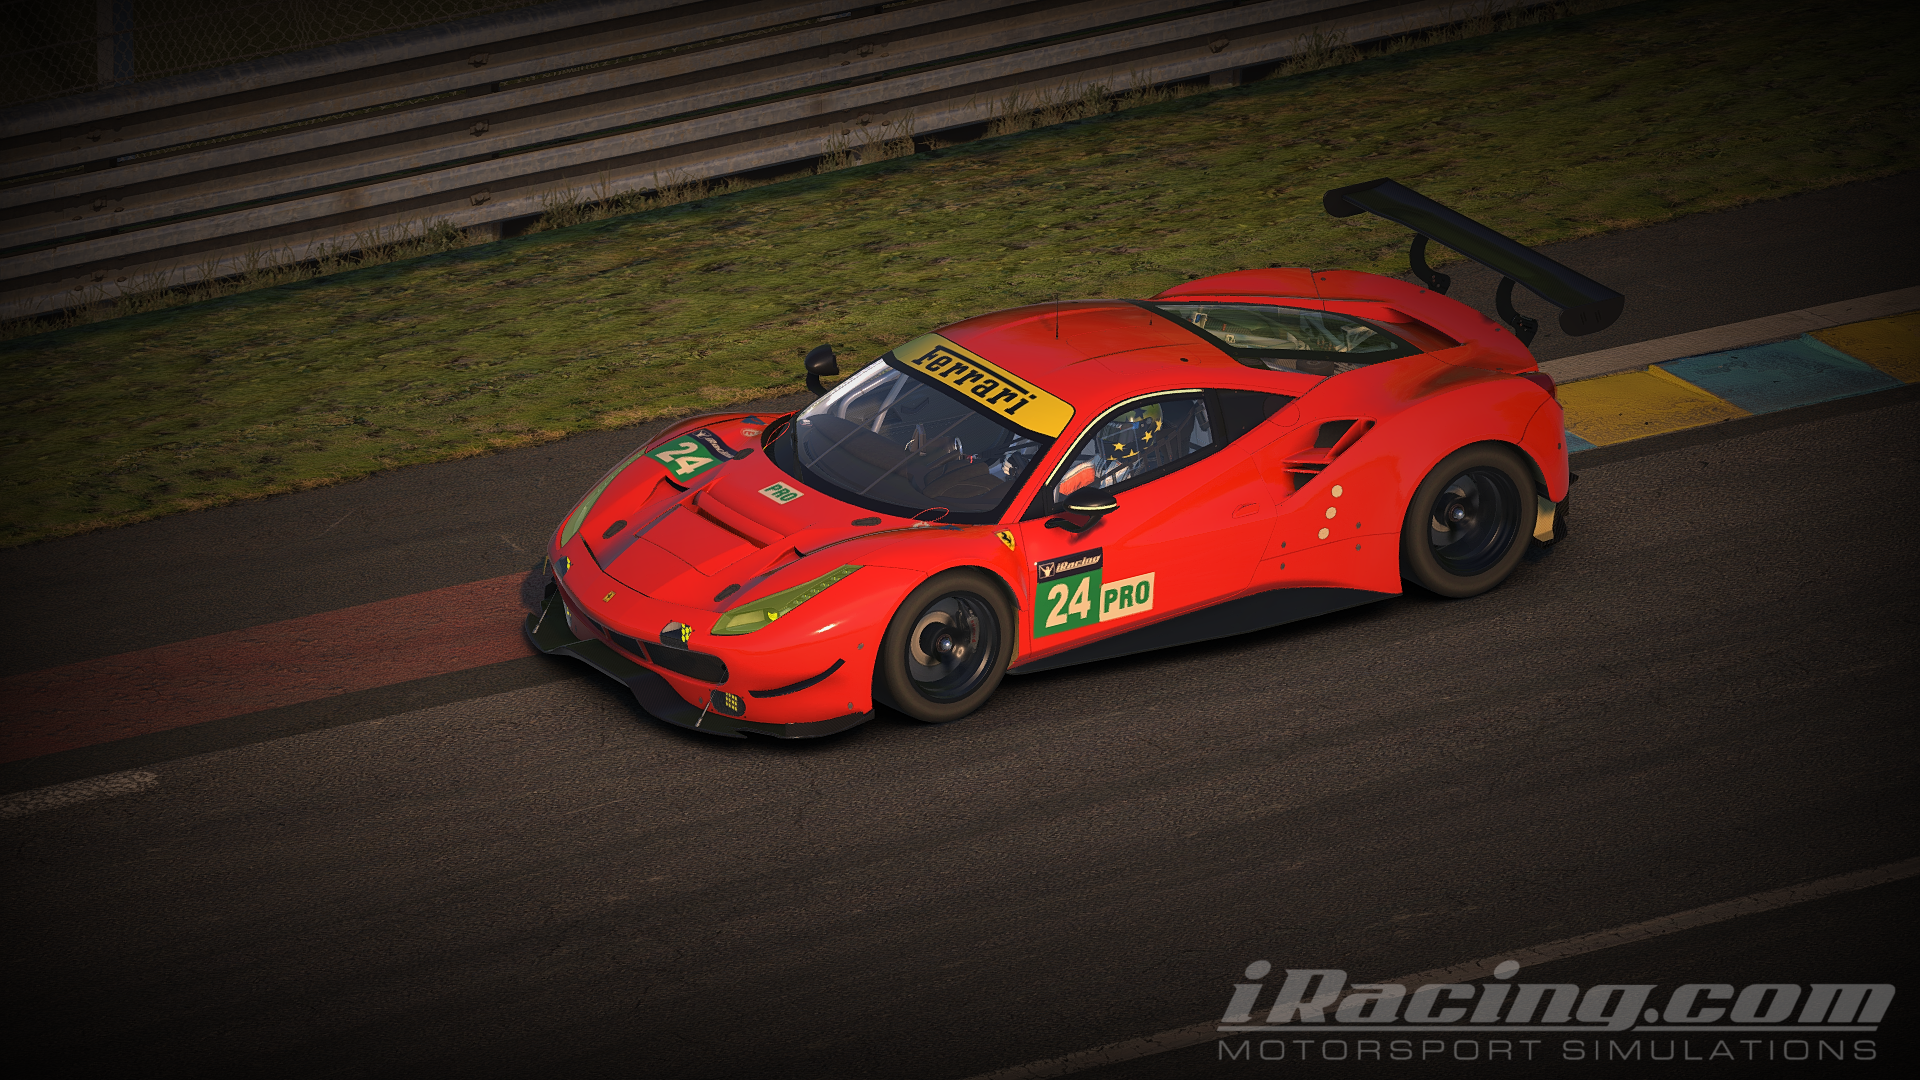 iRacing Ferrari 488 GTE 3